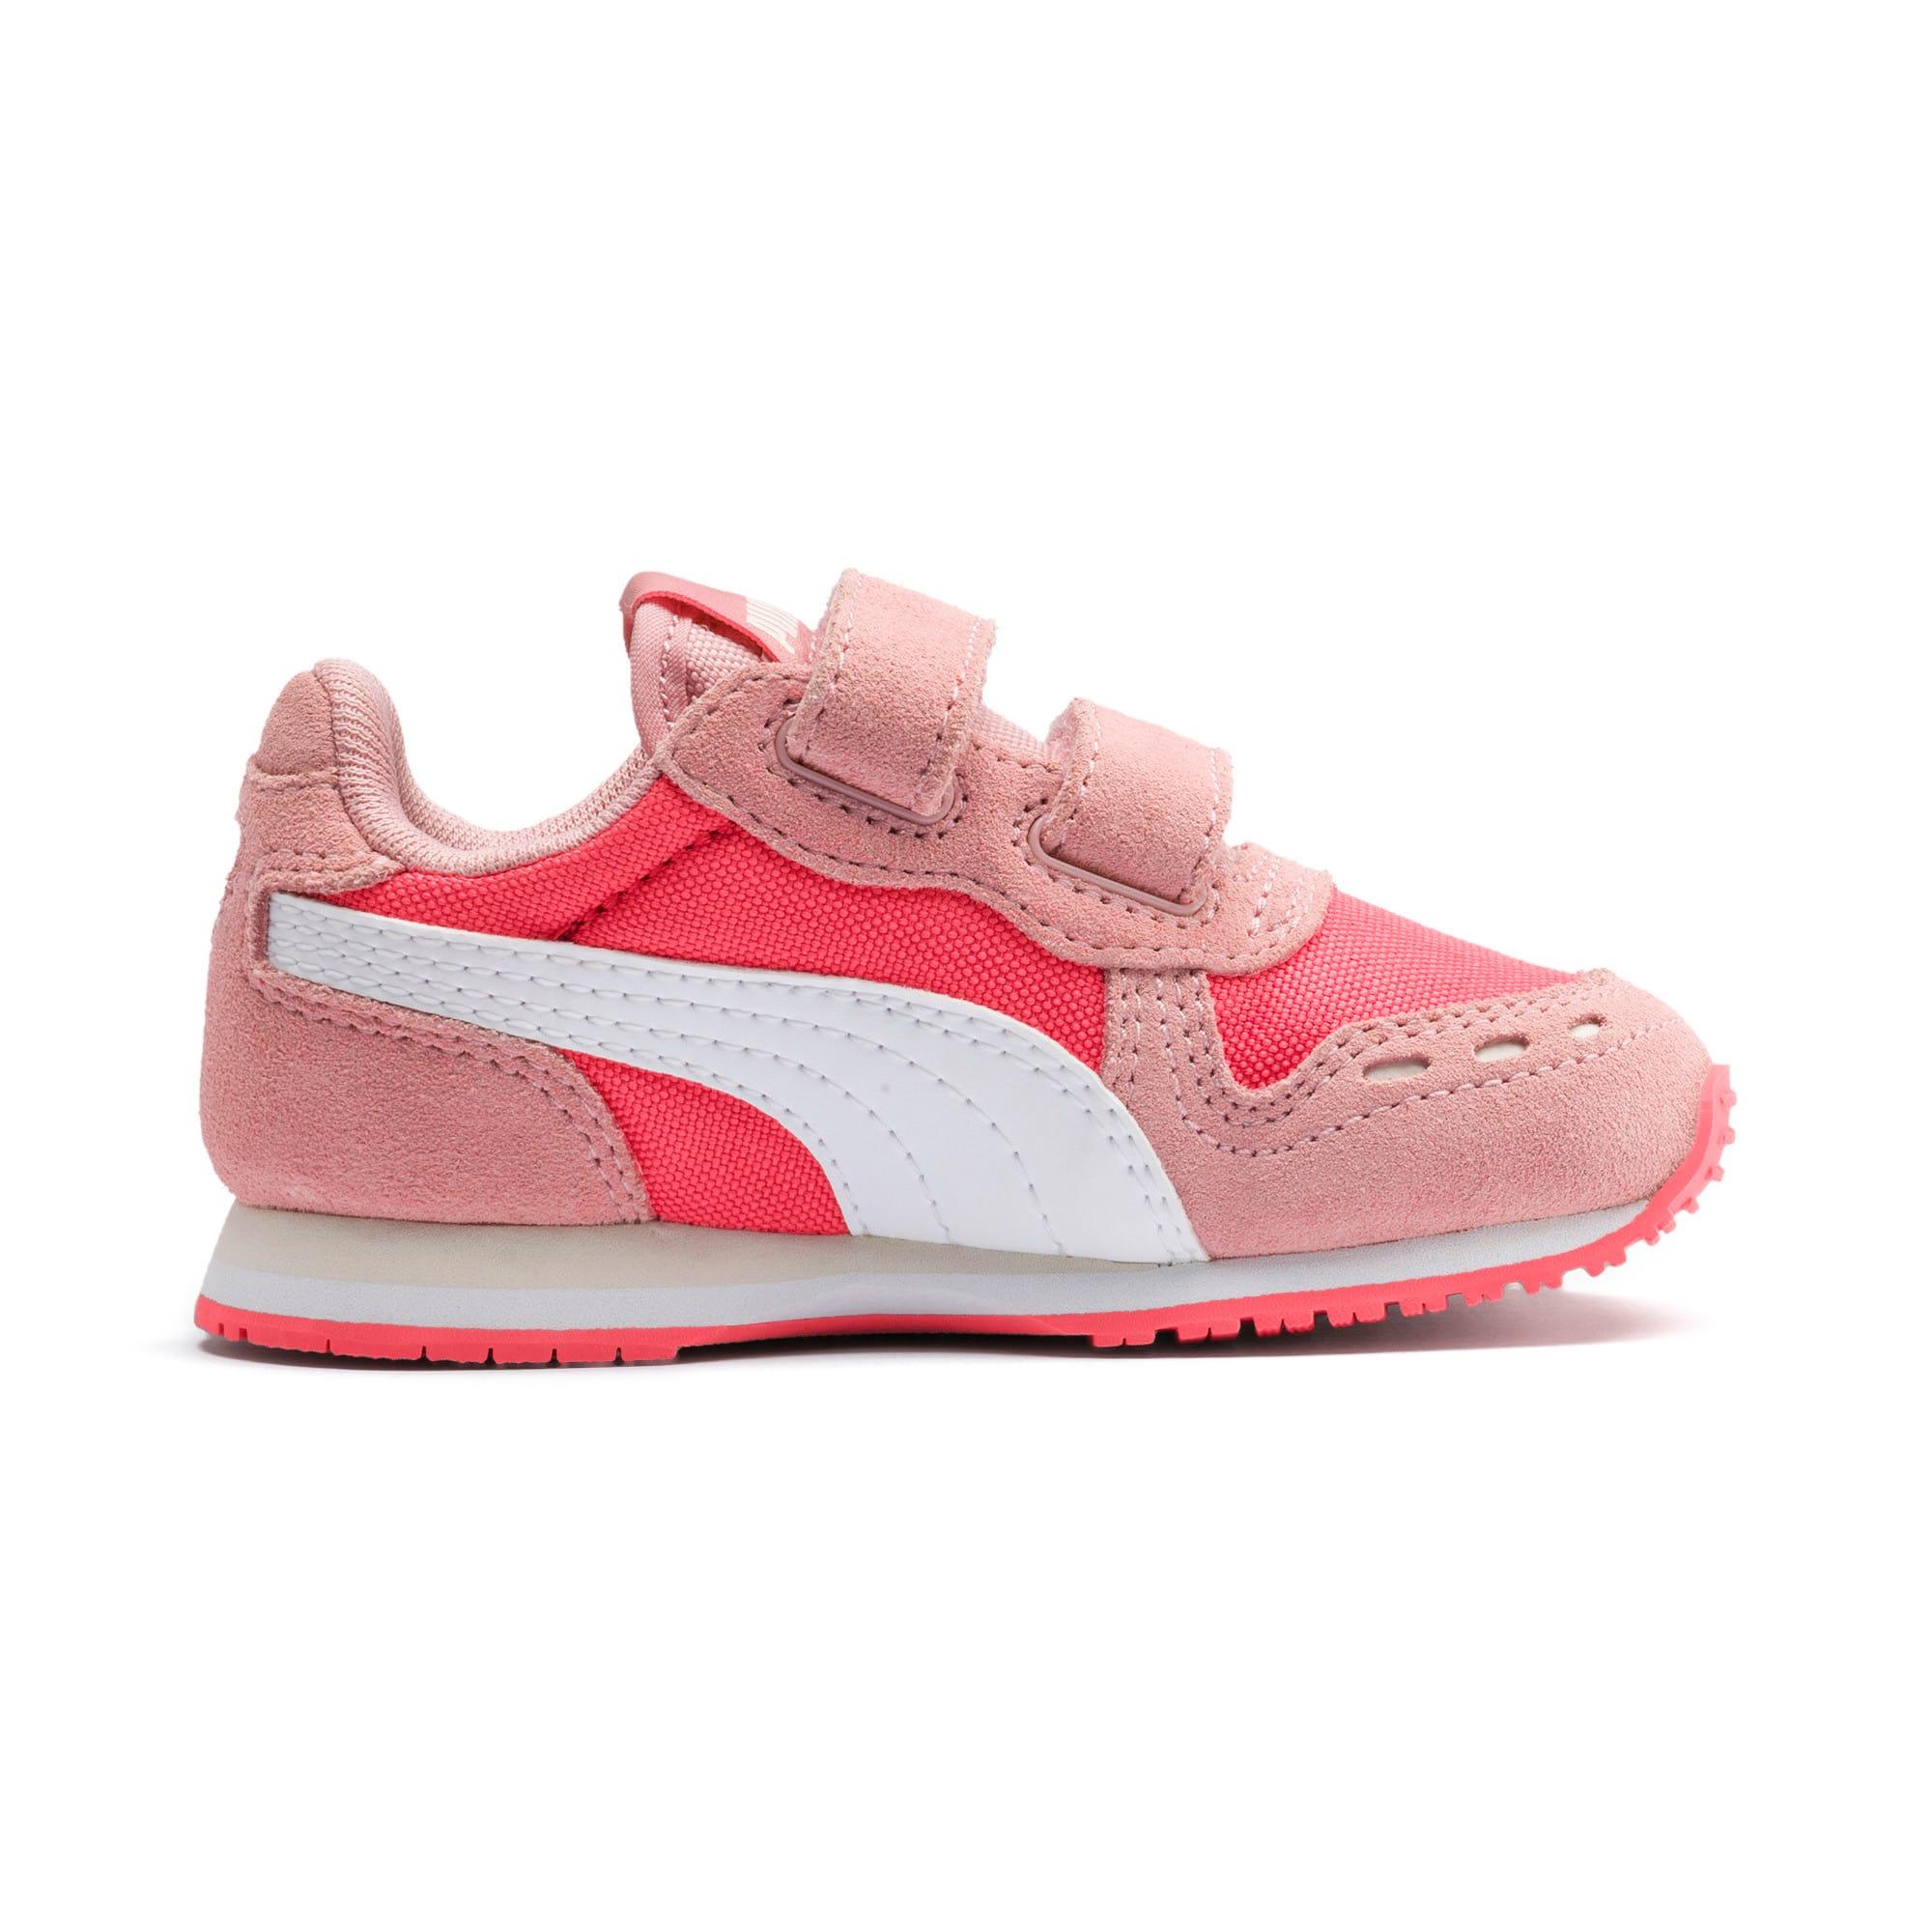 Thumbnail 5 of Cabana Racer Toddler Shoes, Calypso Coral-Bridal Rose, medium